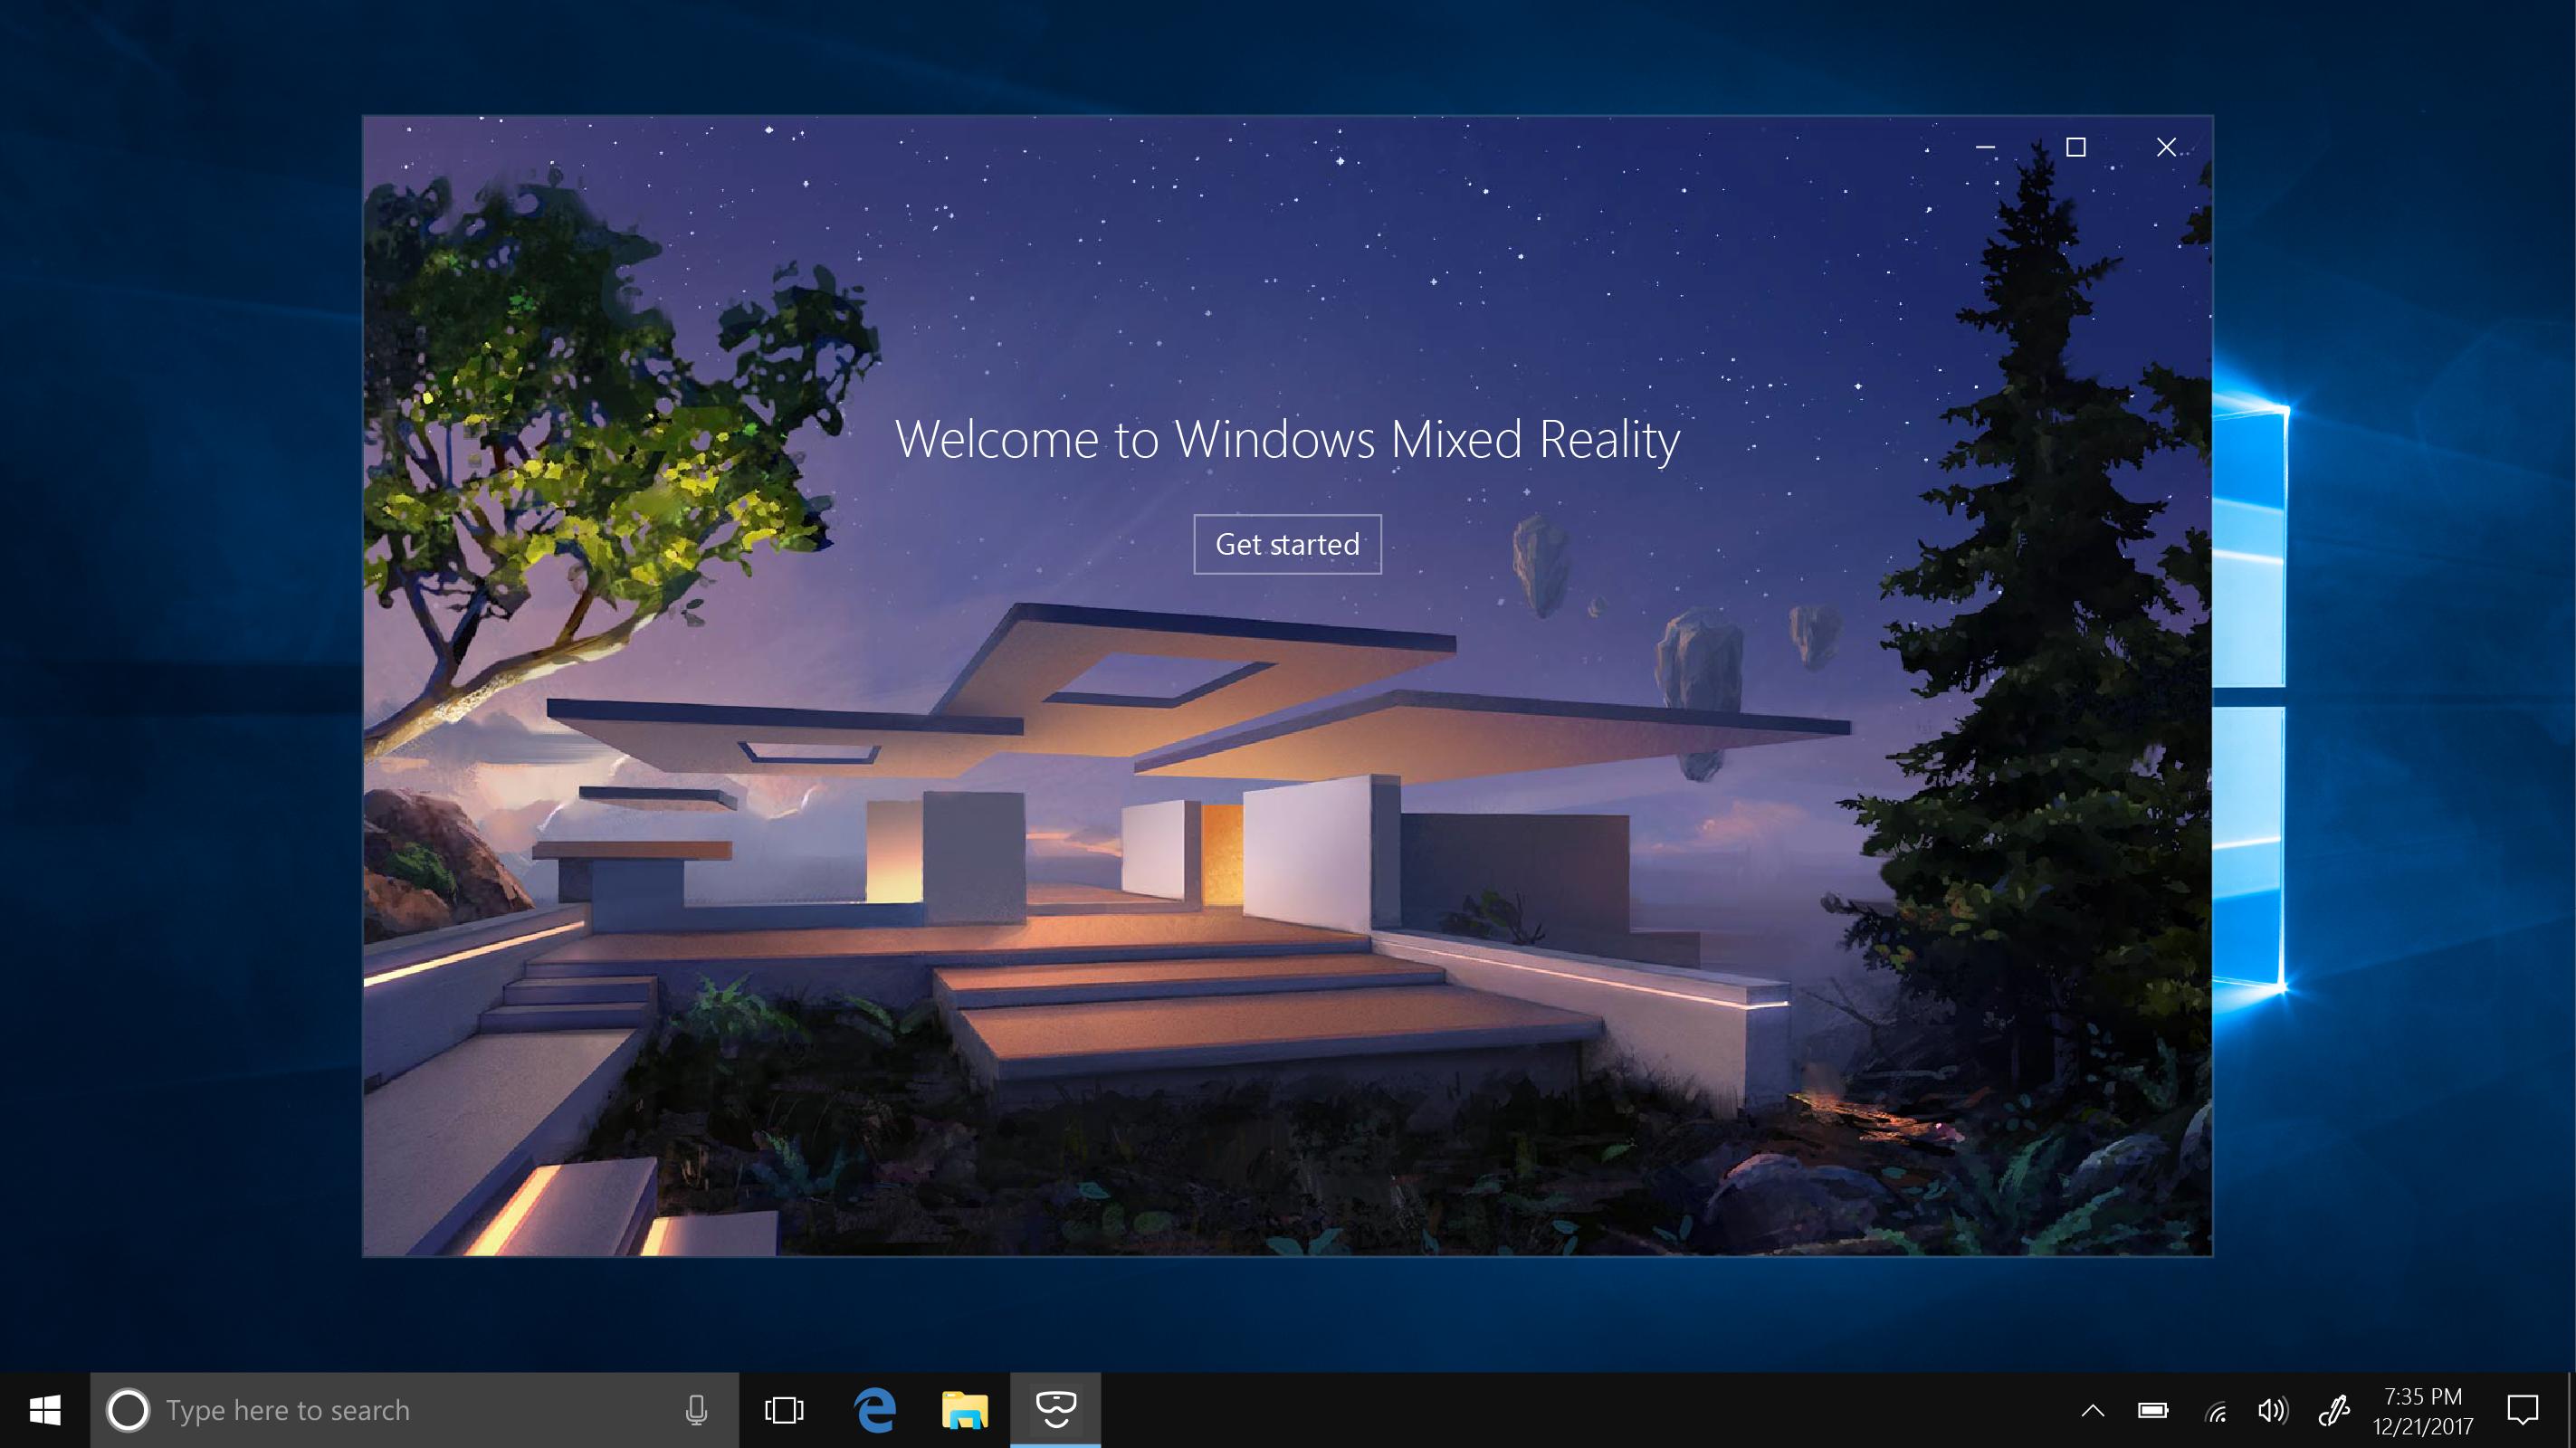 Windows 10 Fall Creators Update Generally Released